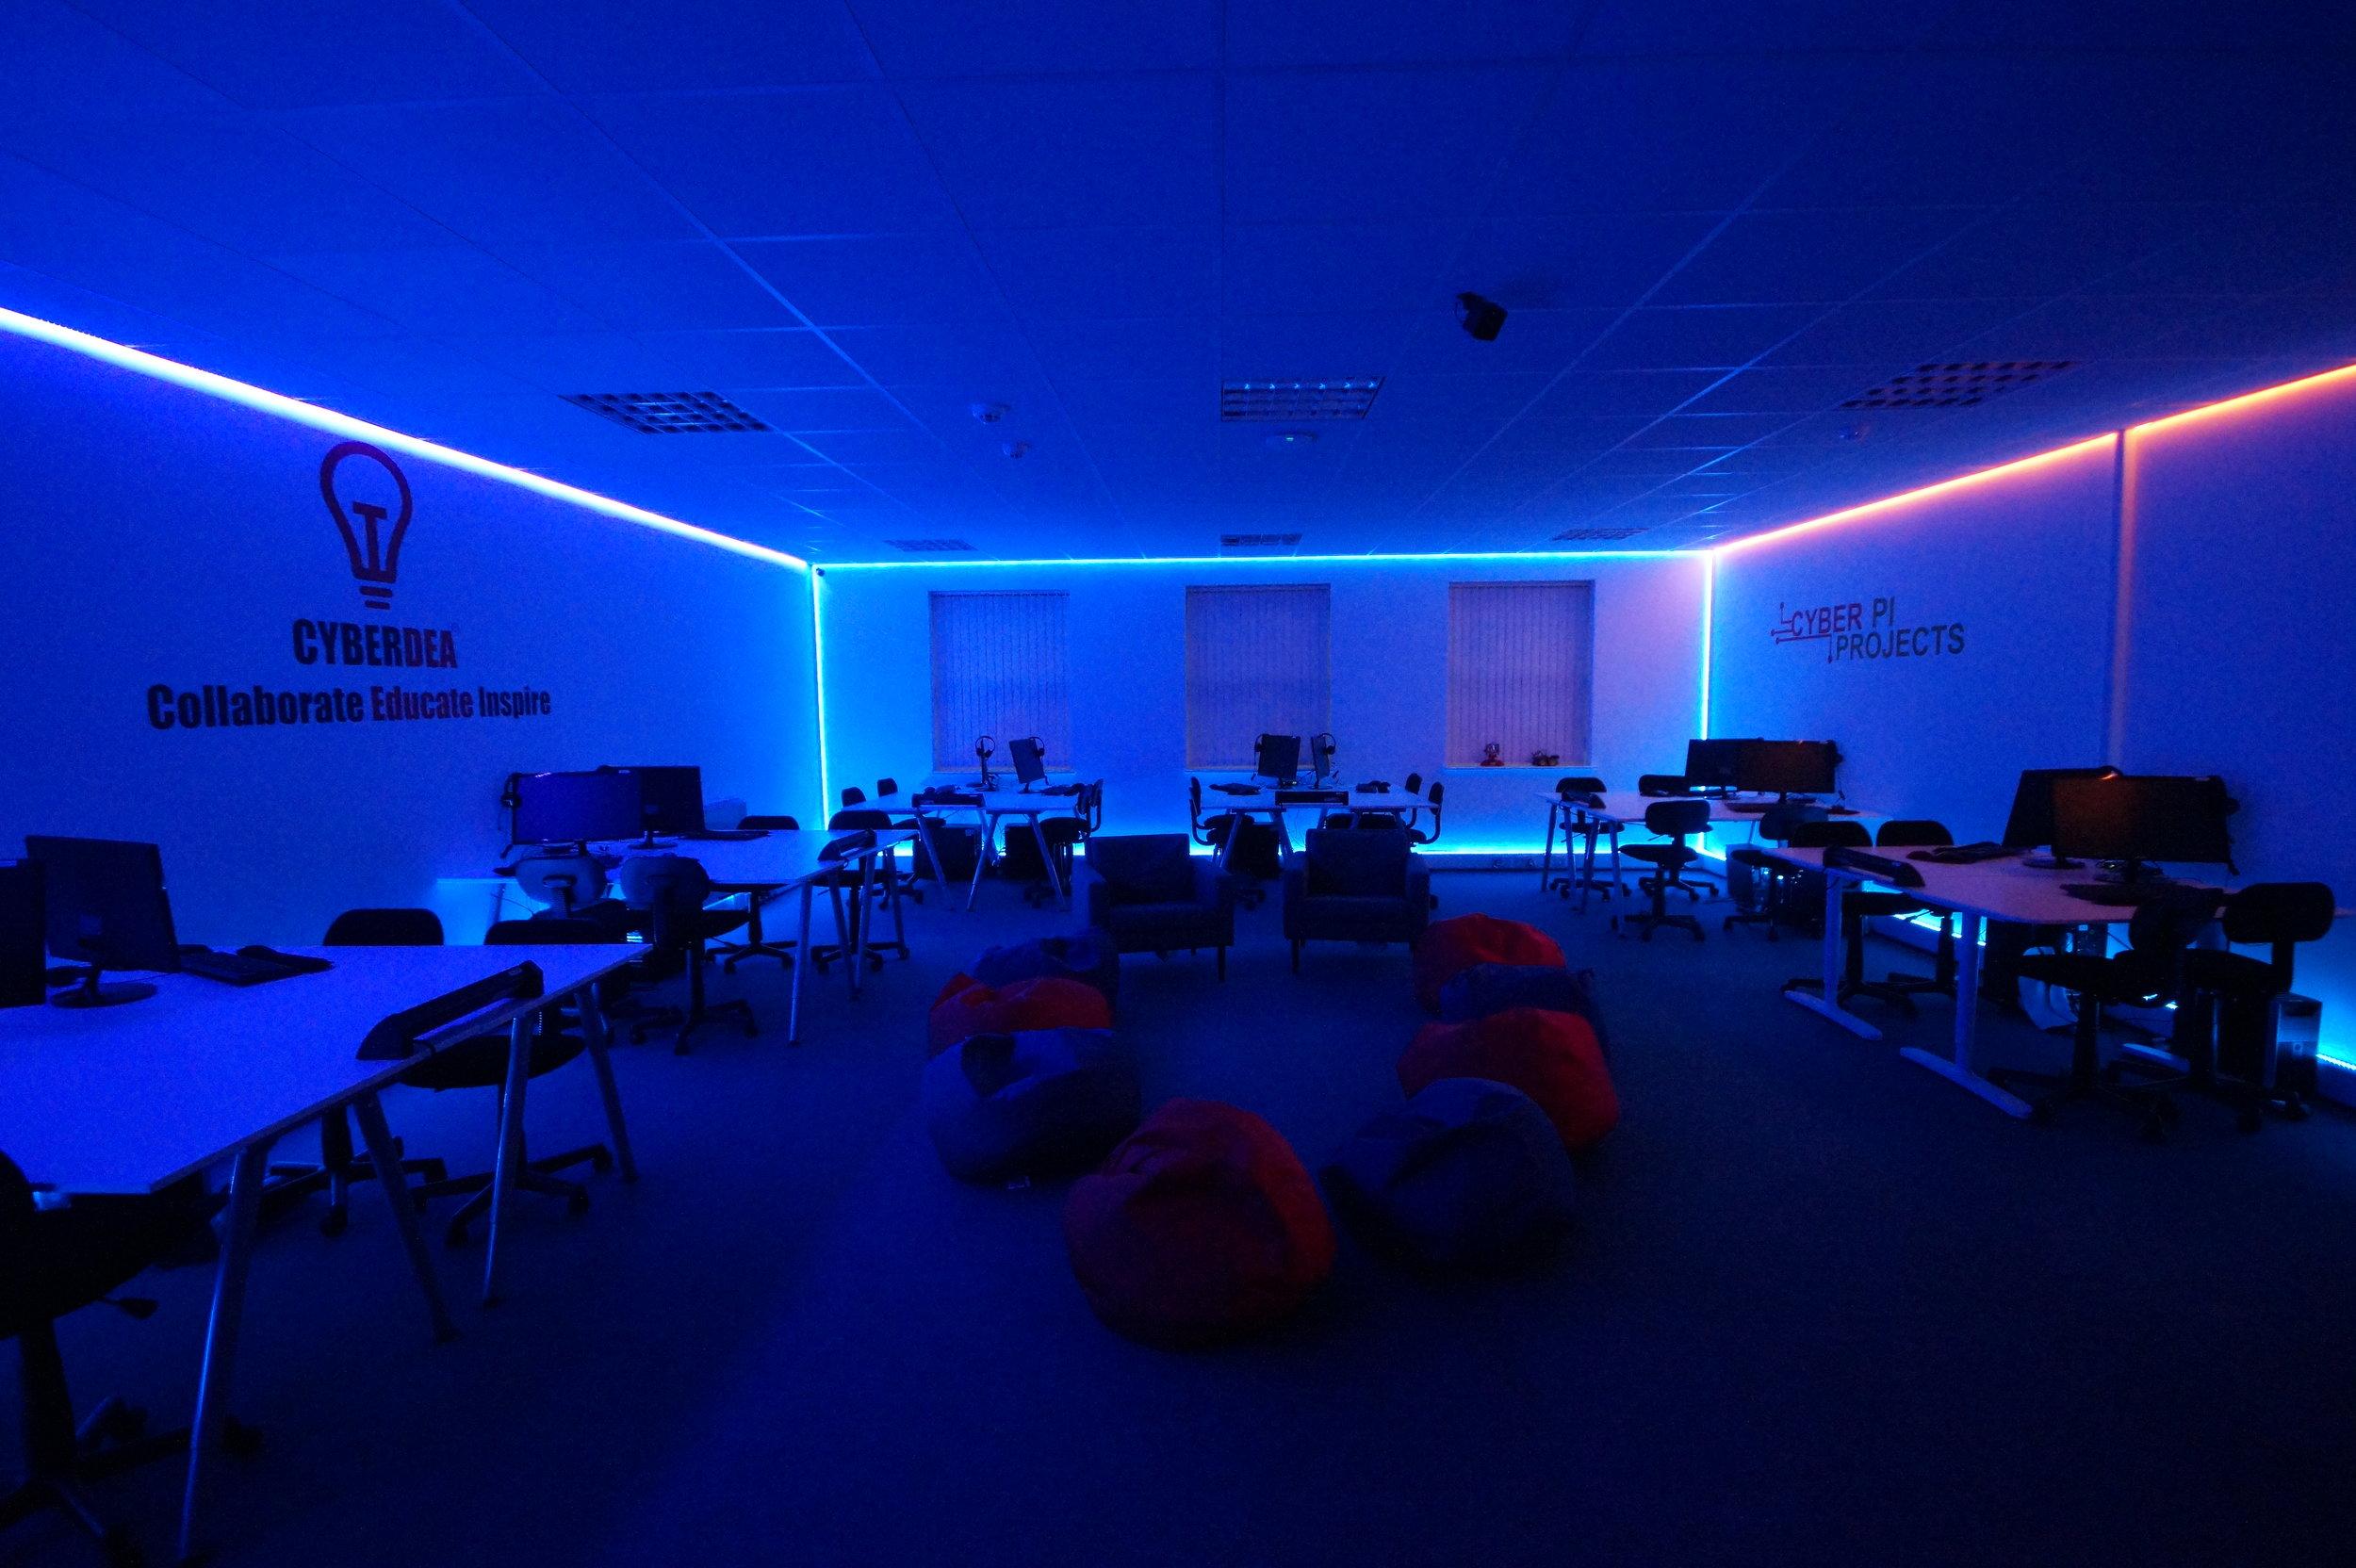 CSA Cyber Training Facility